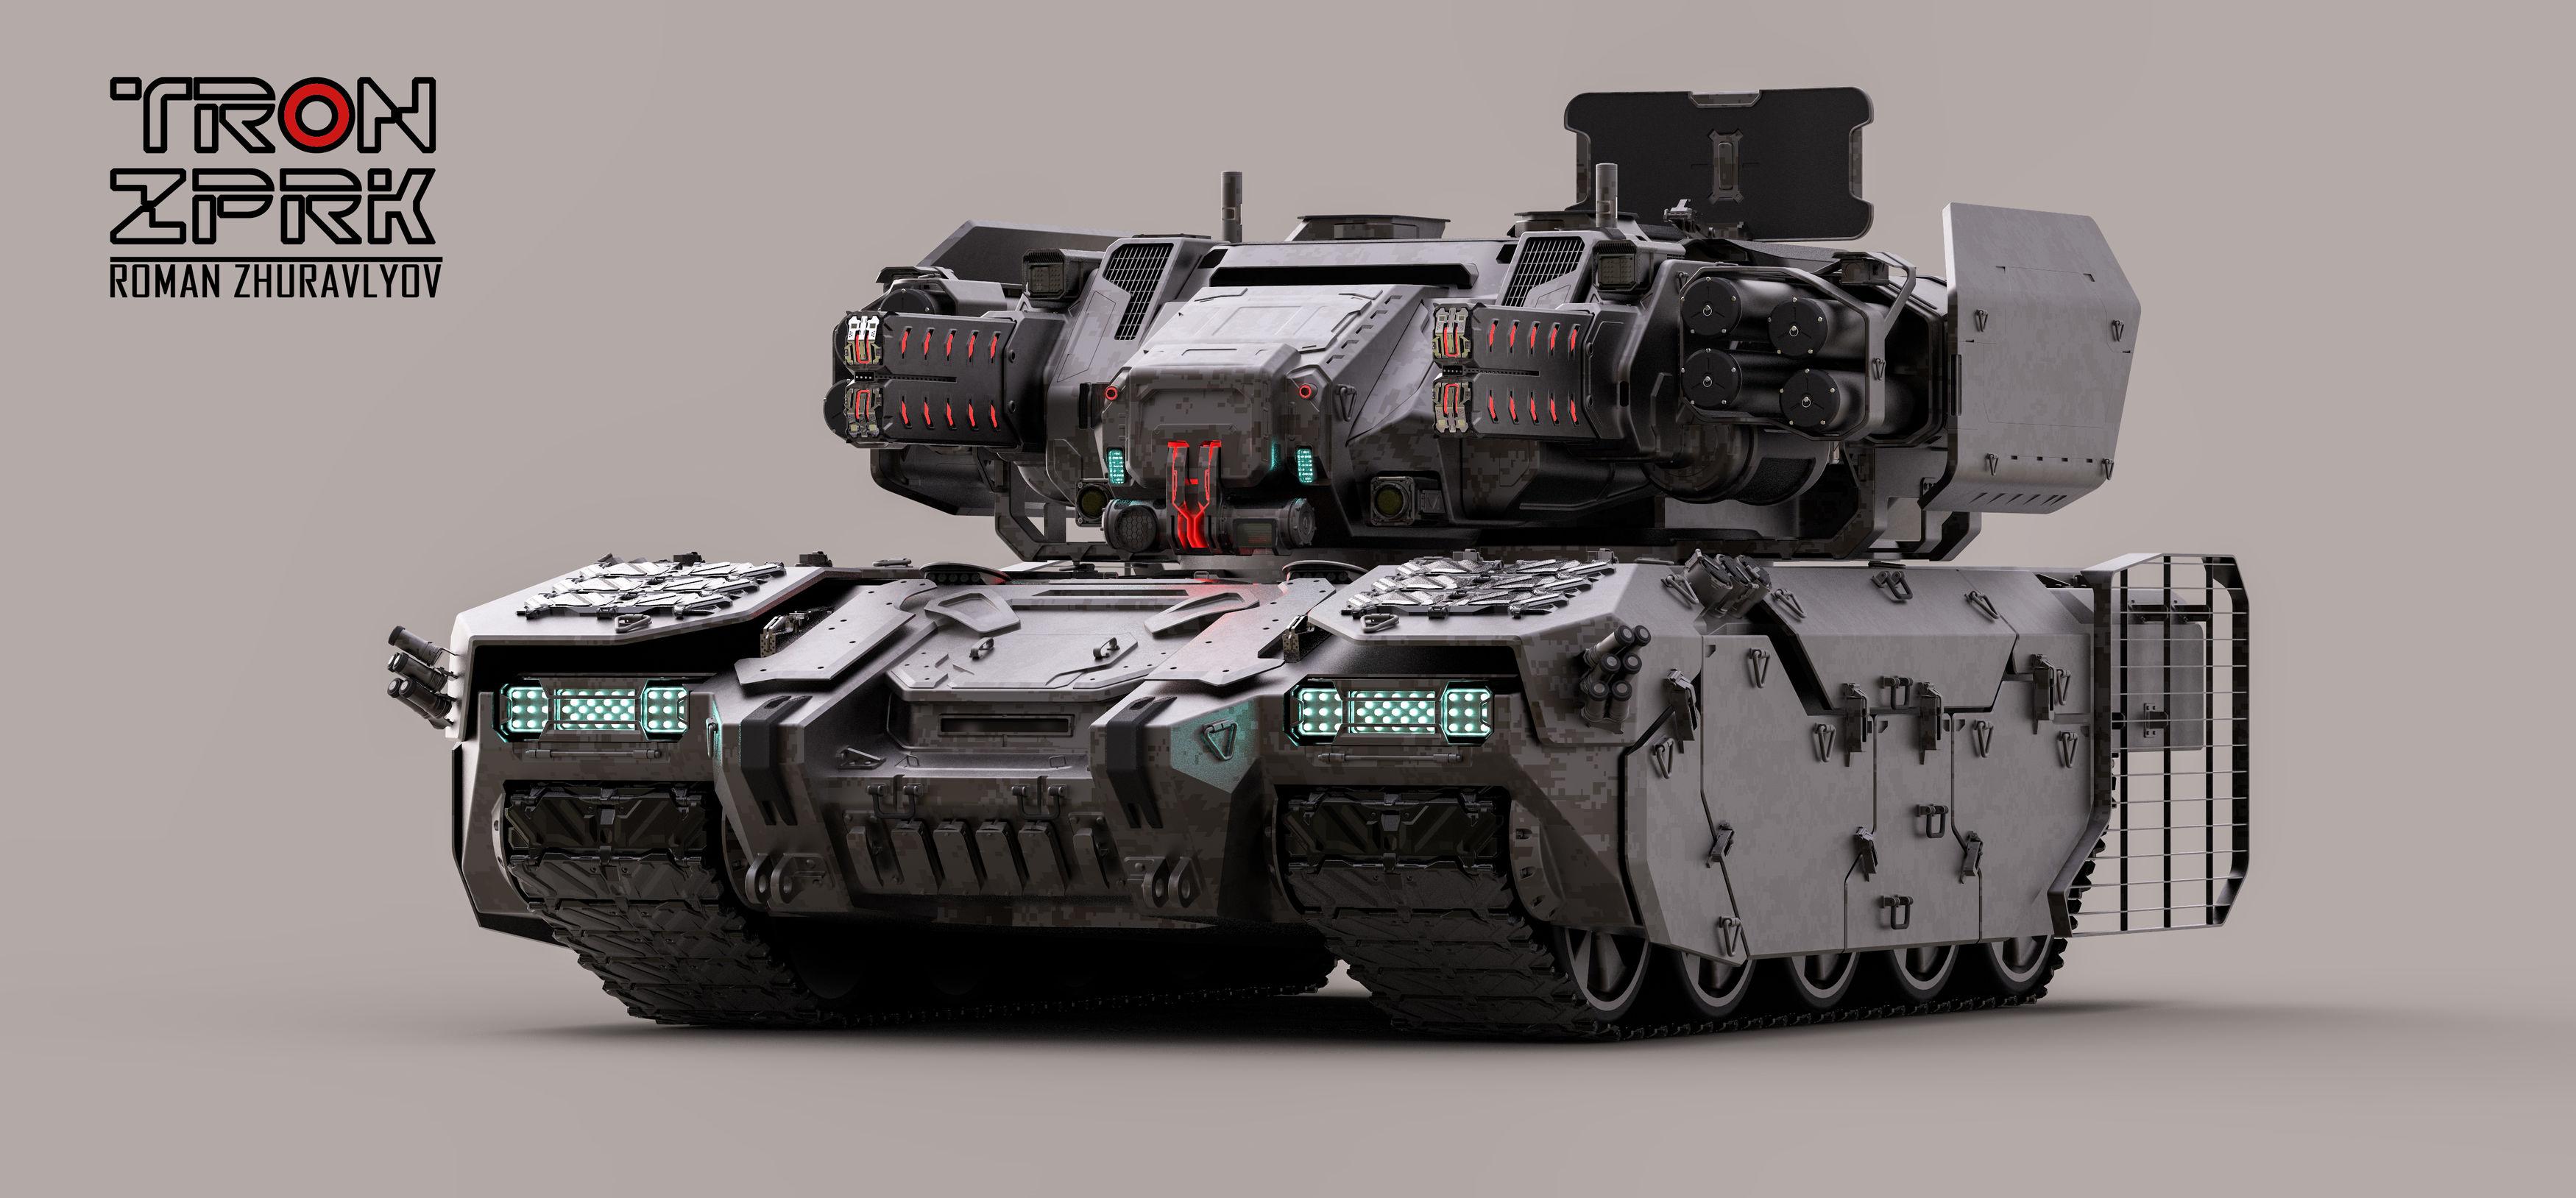 Zprk-tron-1-2-3500-3500